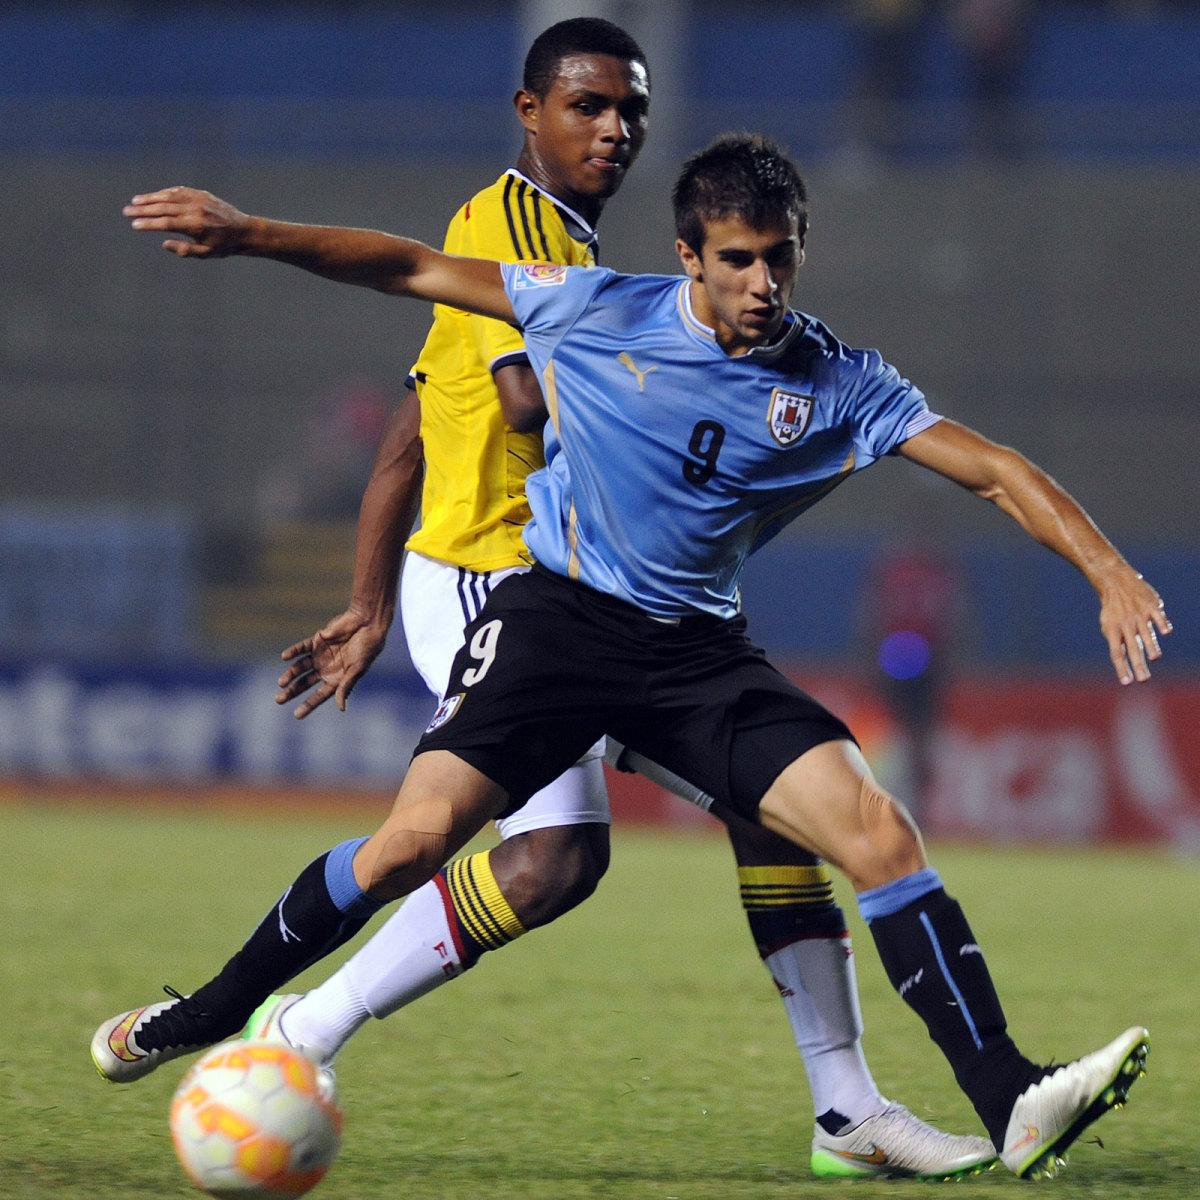 Diego-Rossi-LAFC-MLS-2018.jpg